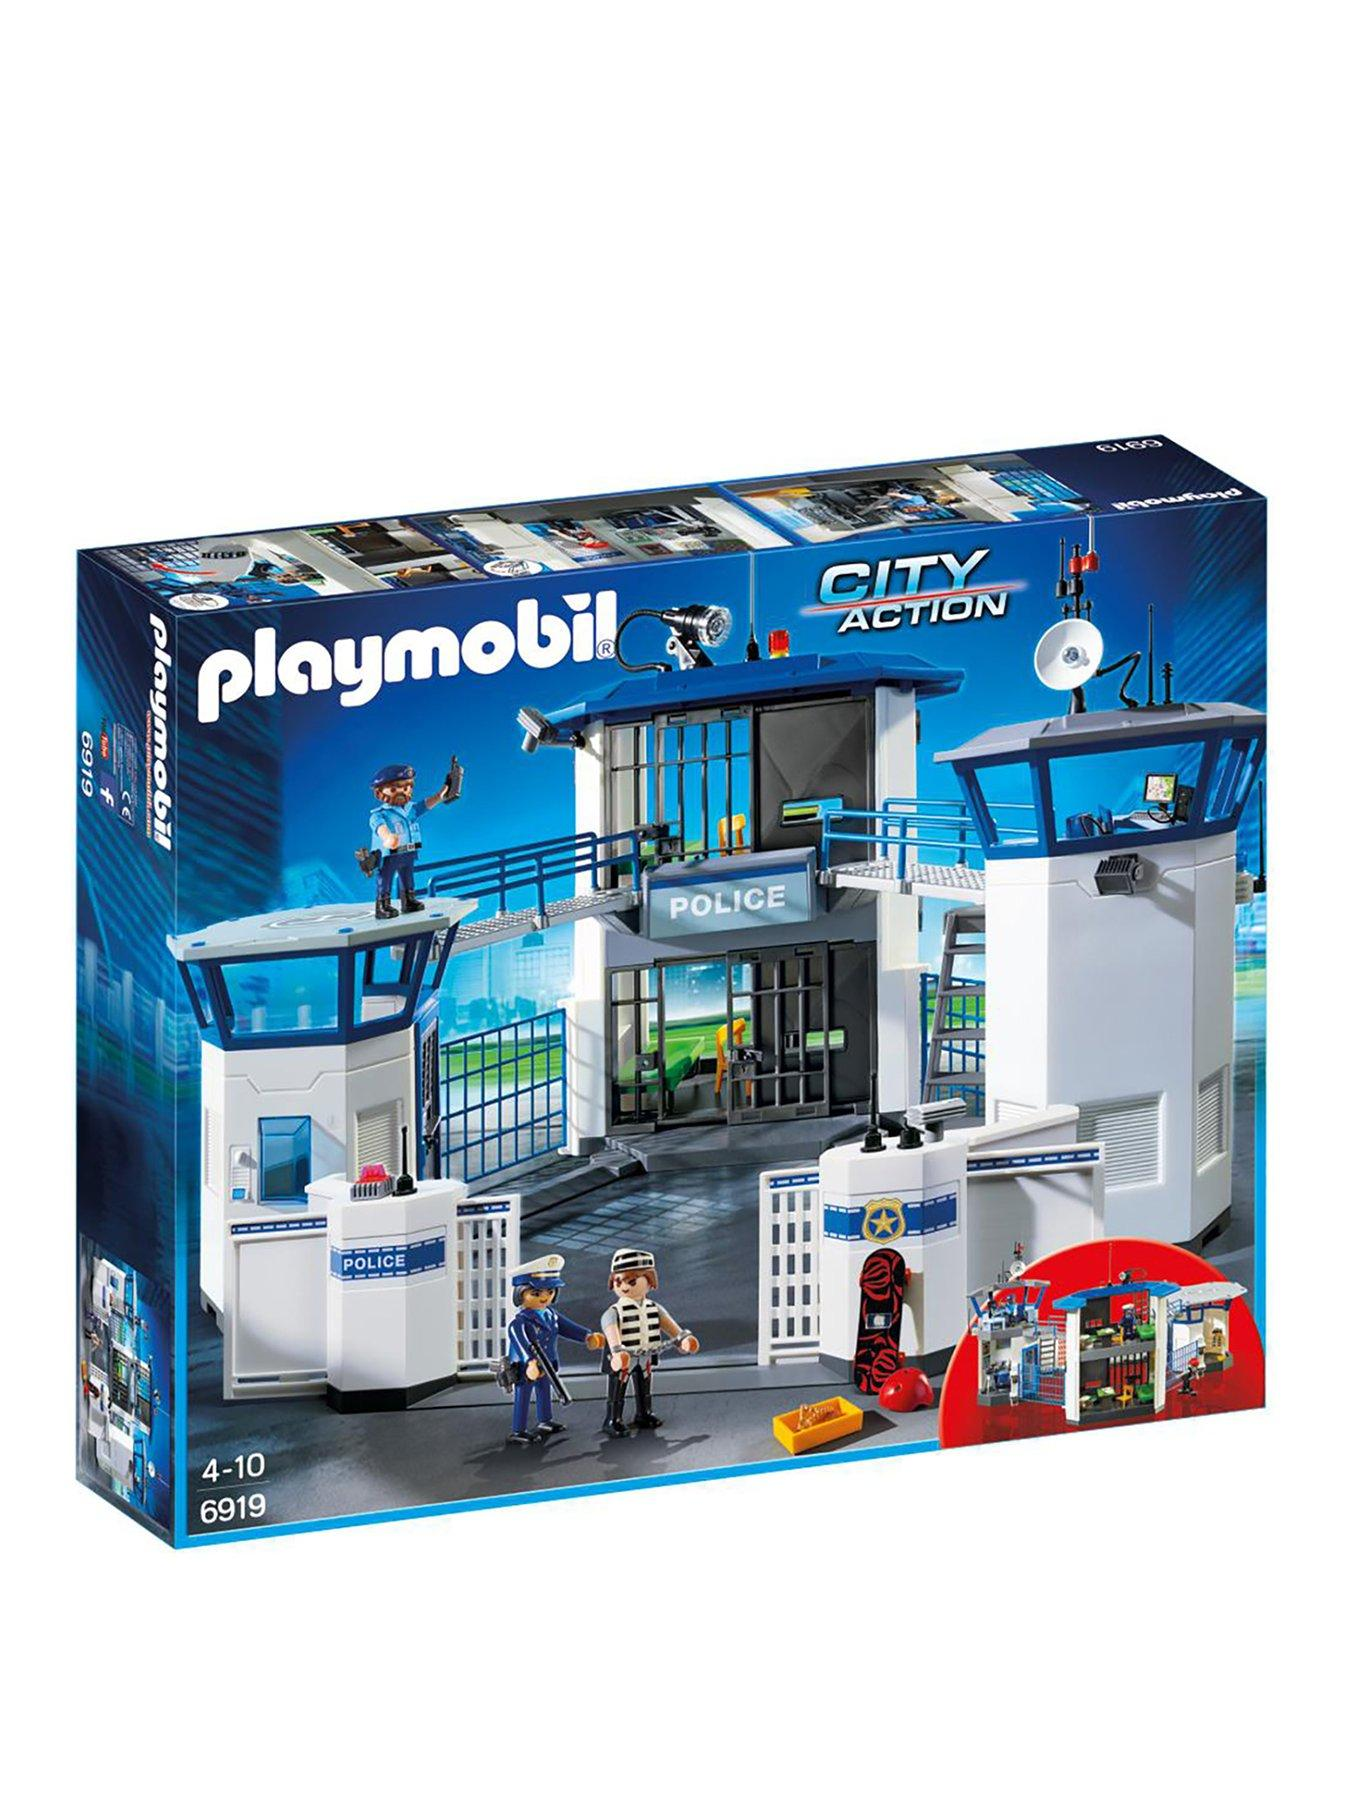 Playmobil J-74 City Action 2x Figures Police Job Lot SWAT